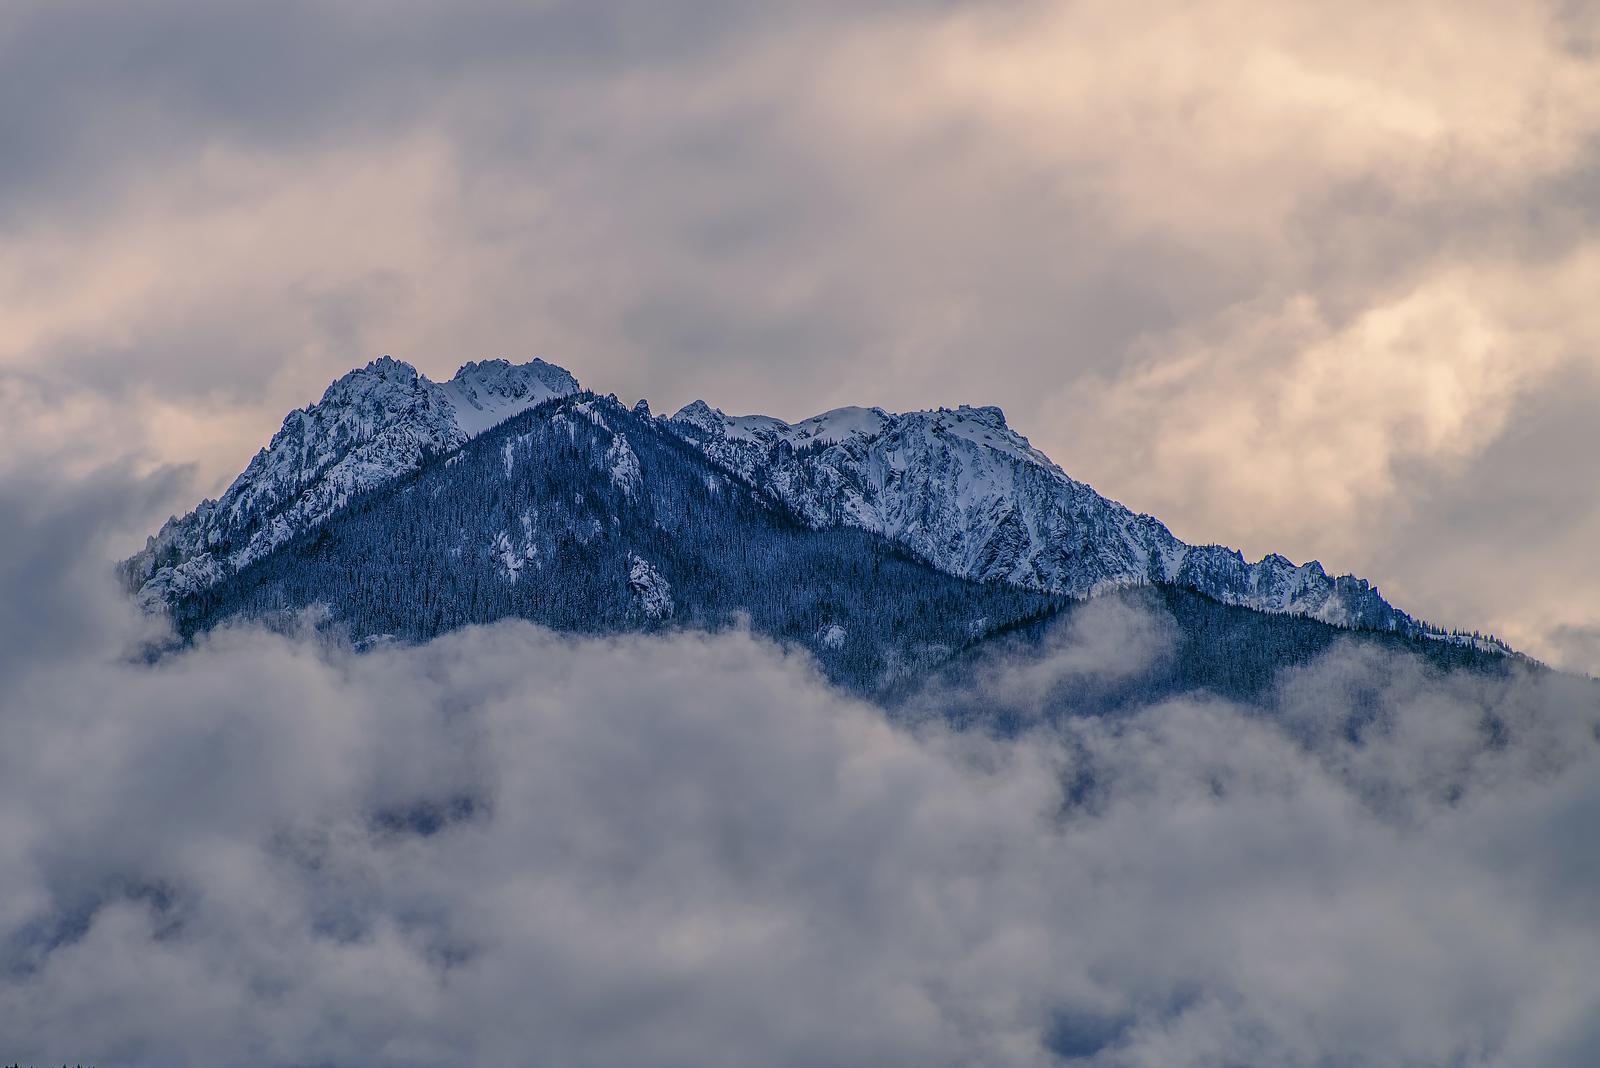 Mt. Angeles from Ediz Hook, Port Angeles, WA